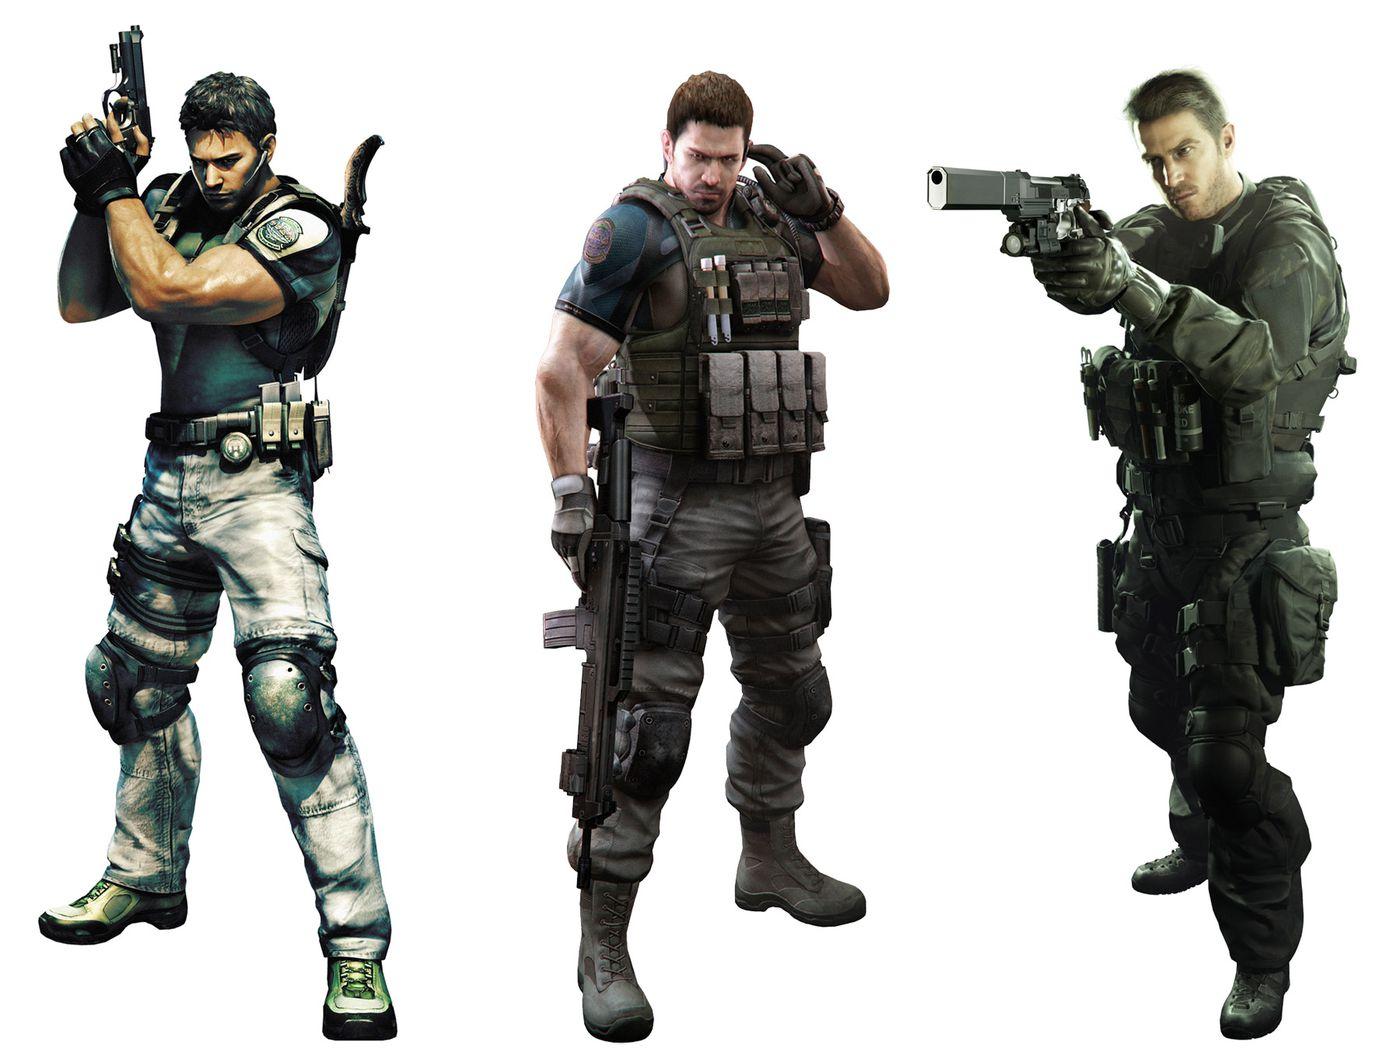 Resident Evil 7 S Next Dlc Stars Chris Redfield Polygon